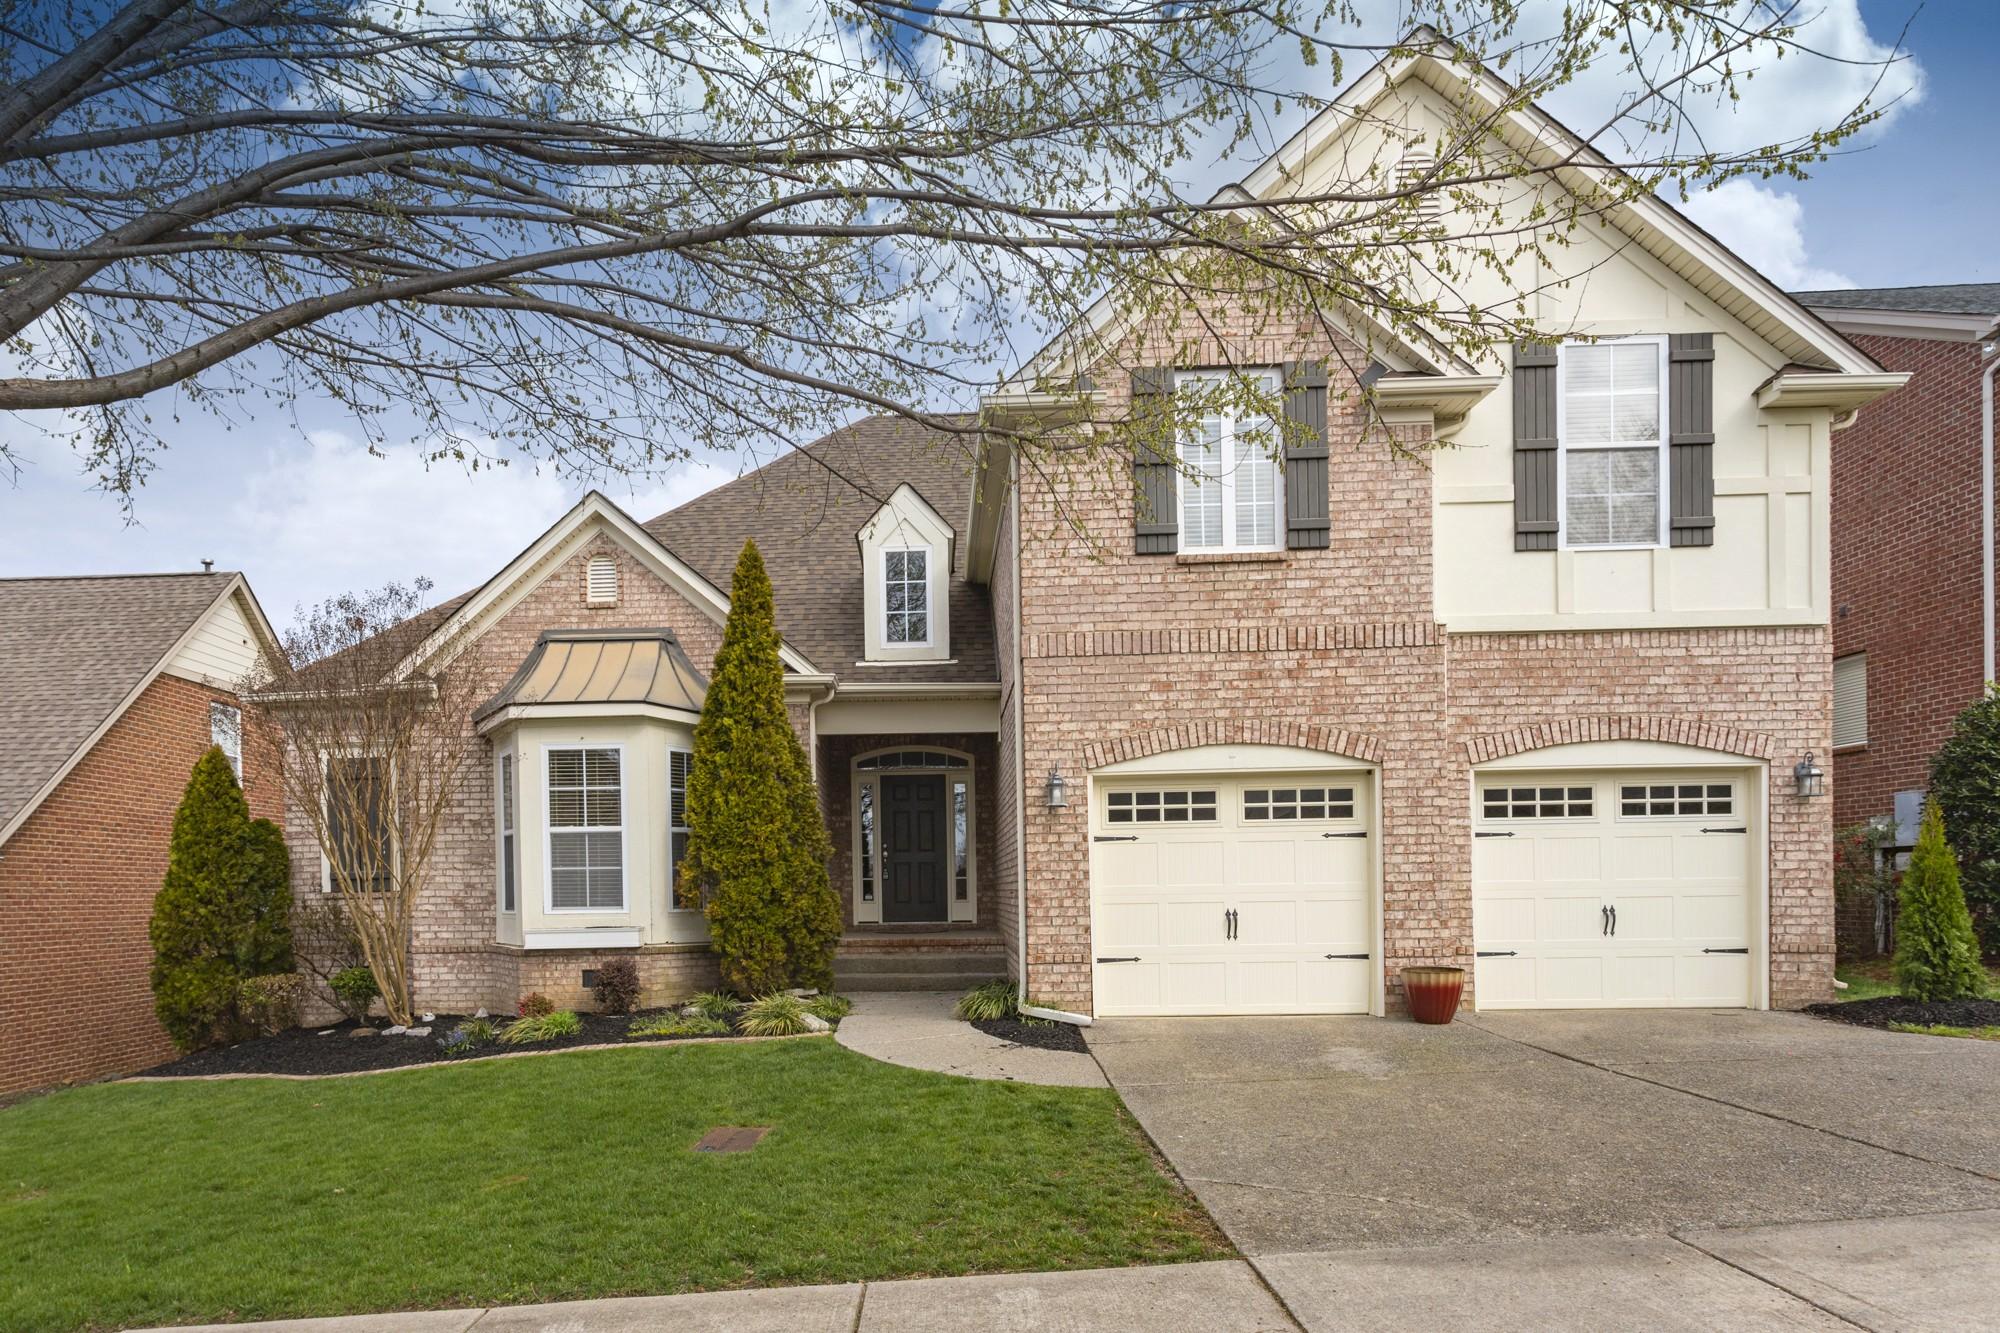 9013 Macauley Ln, Nolensville, TN 37135 - Nolensville, TN real estate listing